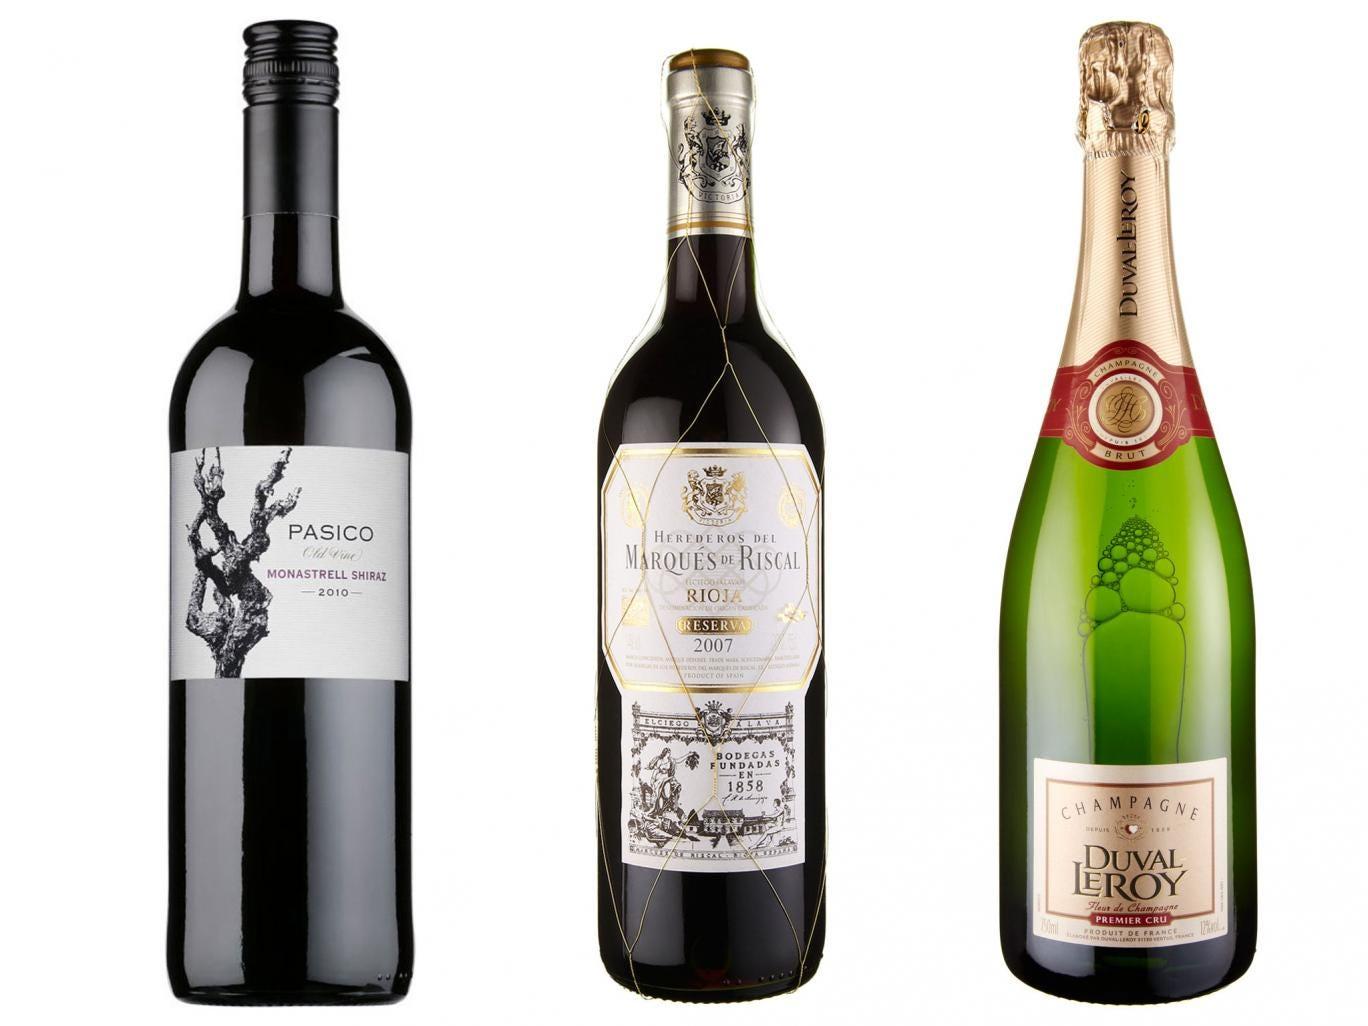 2012 Pasico Old Vine Monastrell Shiraz; 2008 Marqués de Riscal Rioja Reserva; Duval-Leroy Fleur de Champagne